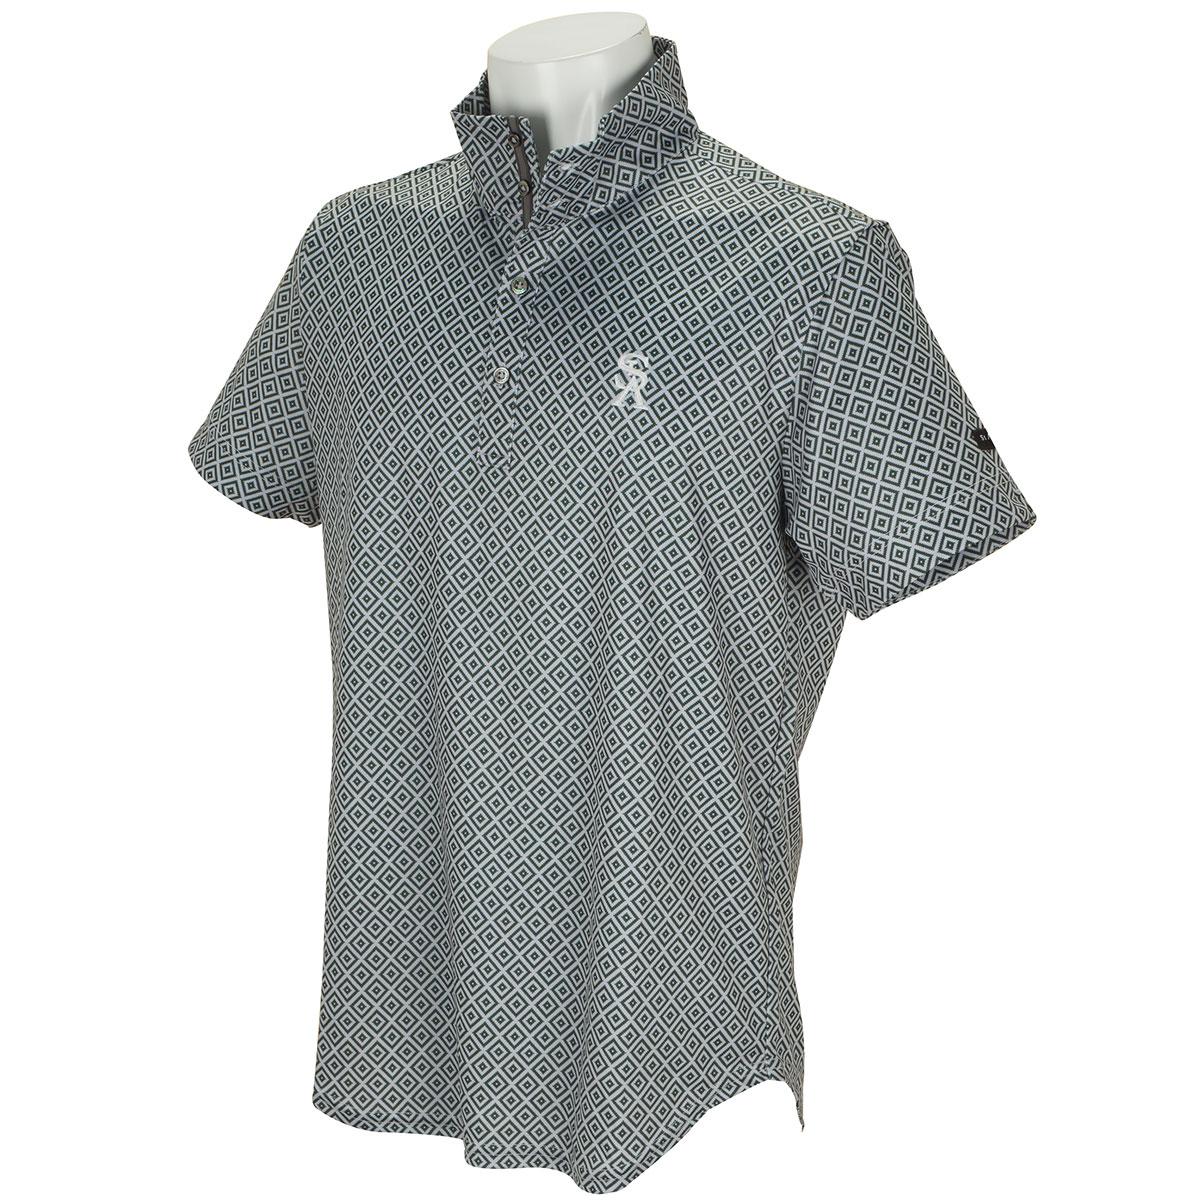 COOLMAX 鹿の子幾何学プリント 半袖ポロシャツ